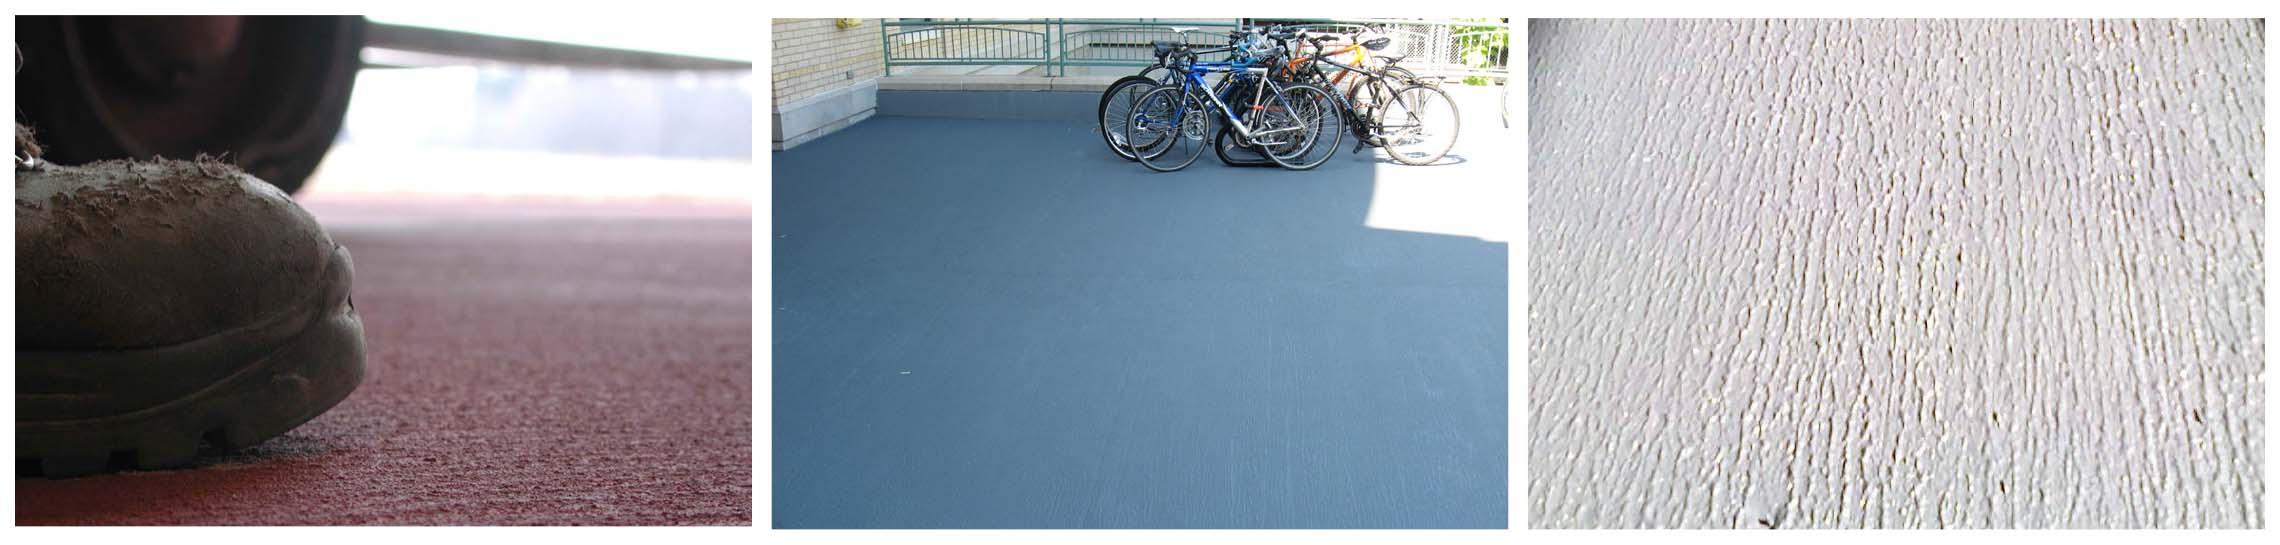 Concrete Floor Coating Systems 10